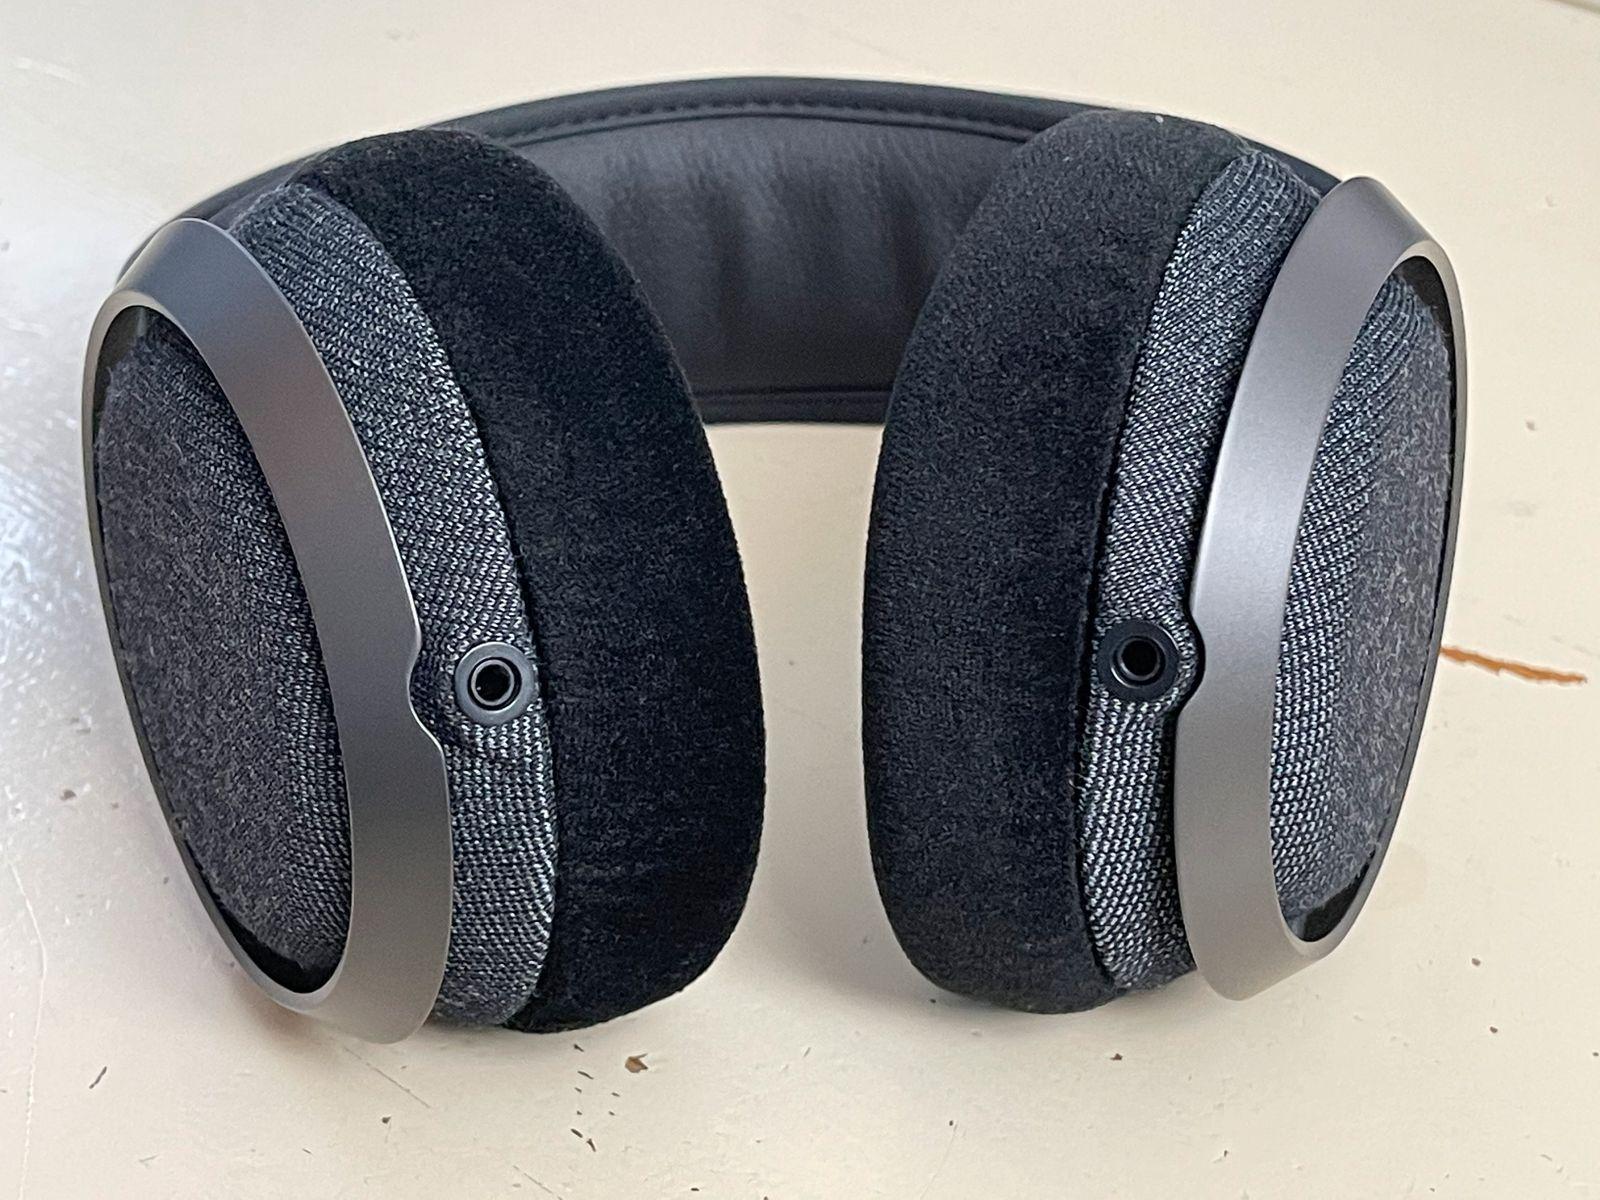 Kopfhörer / Philips Fidelio X3